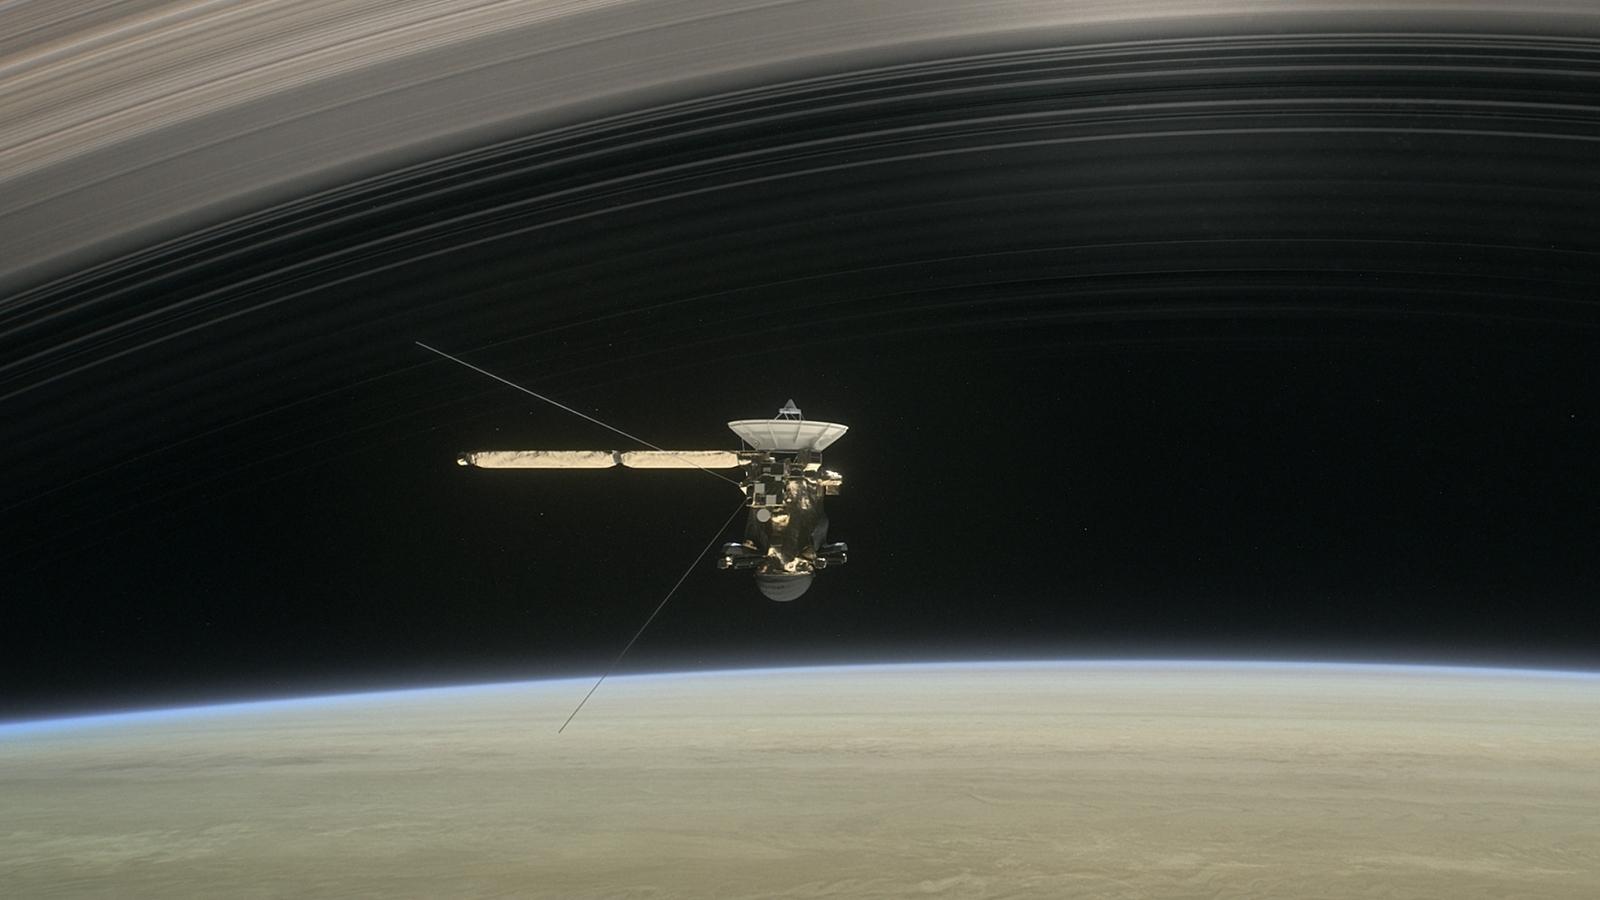 Cassini makes the plunge